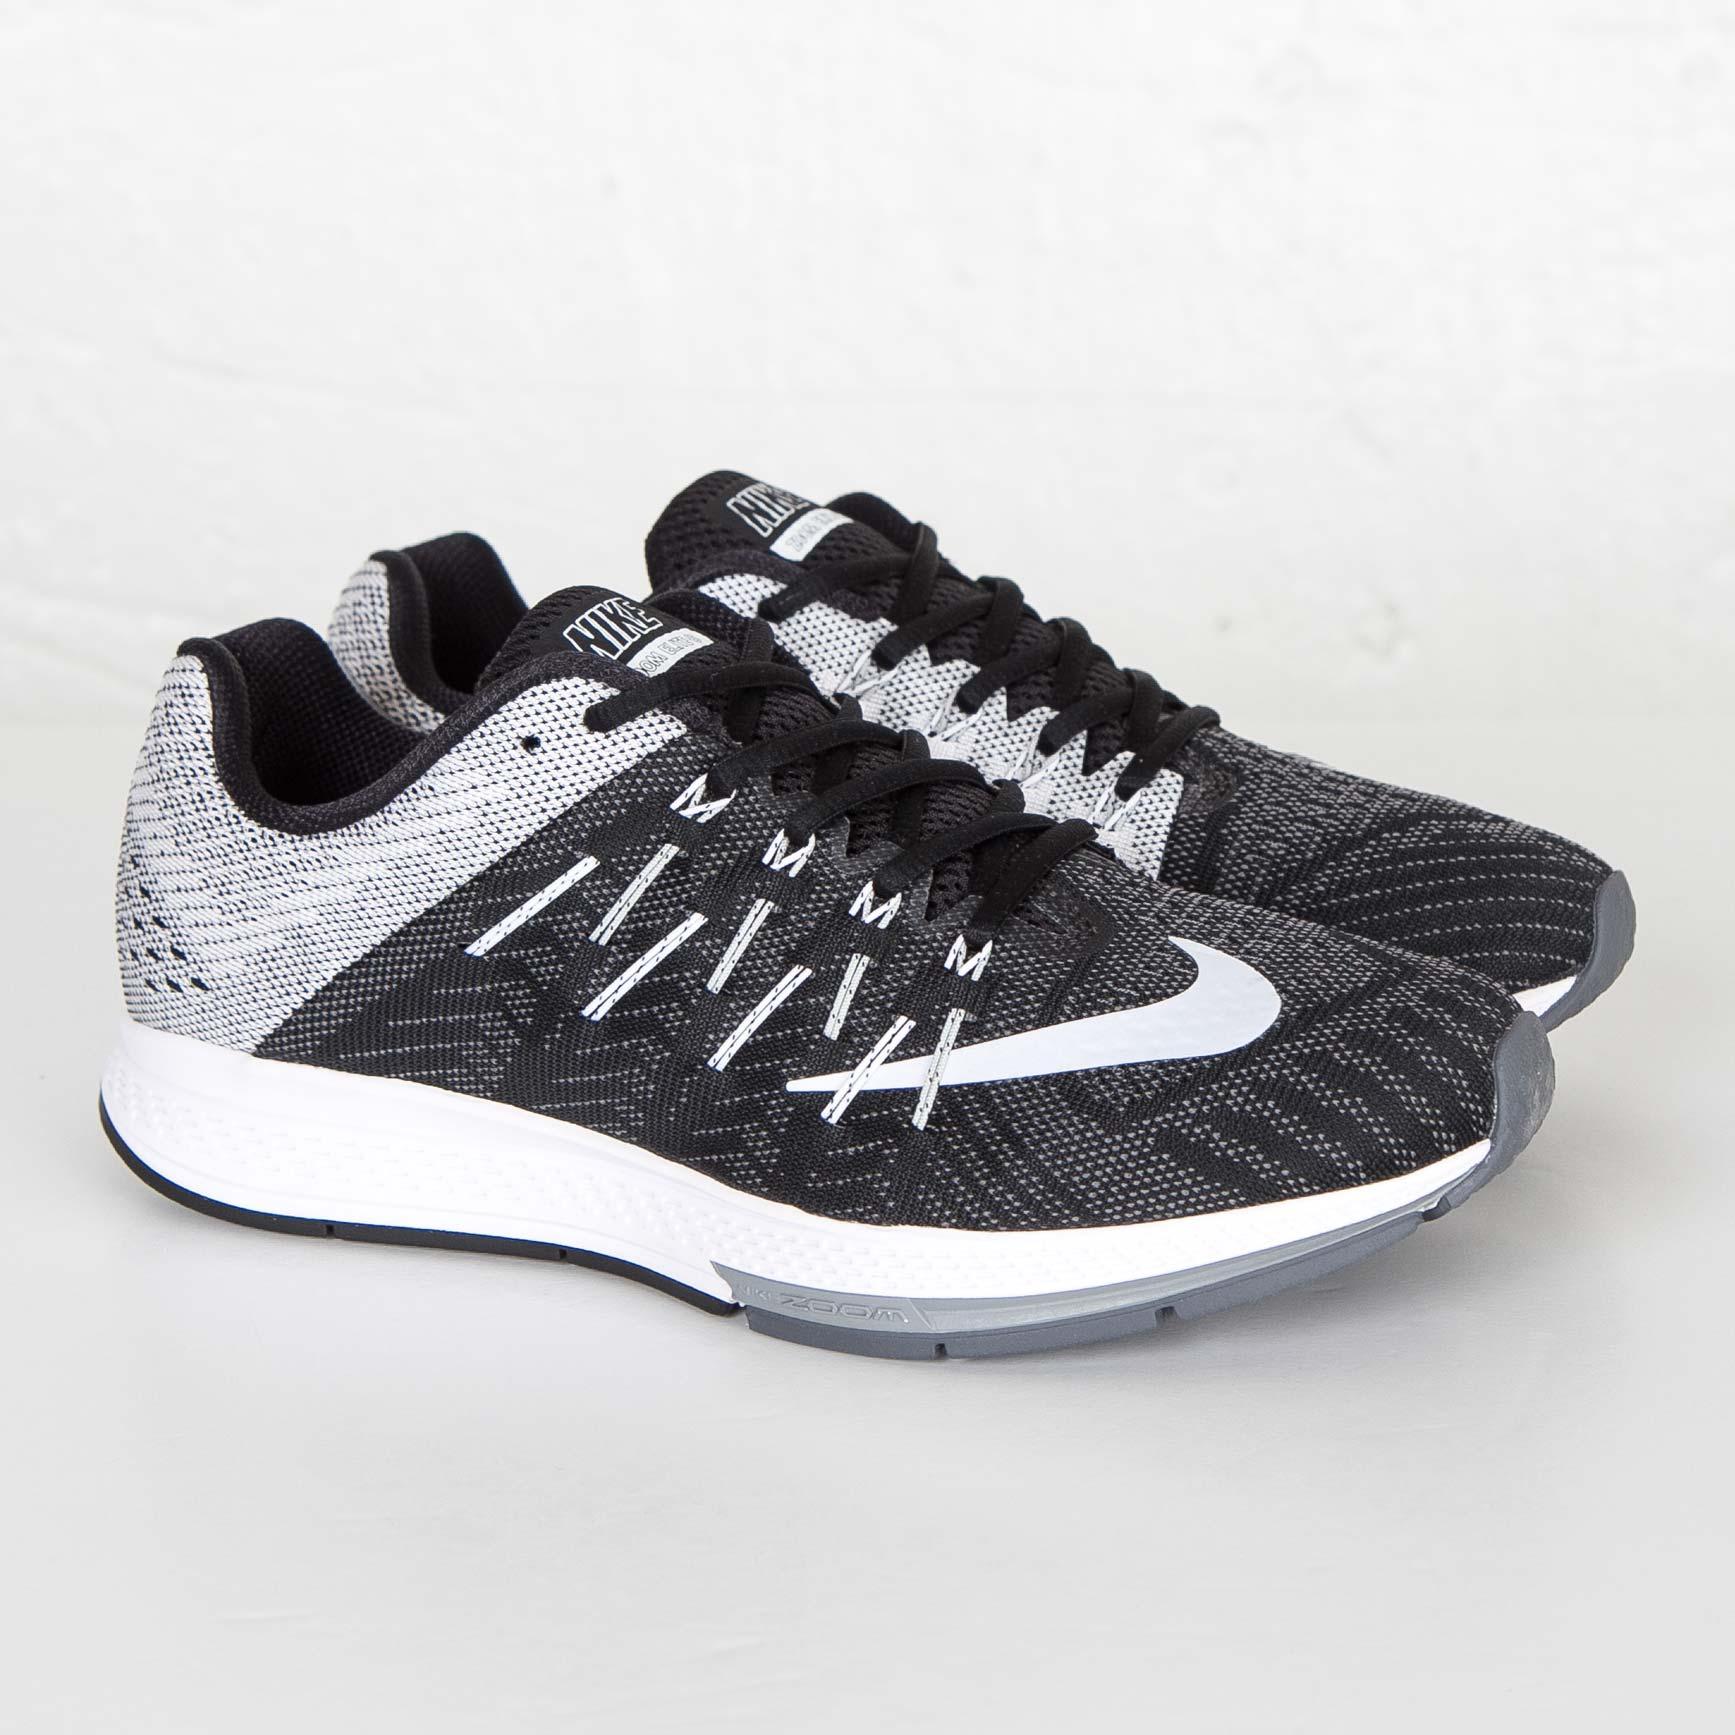 31e31778f7c Nike Air Zoom Elite 8 - 748588-001 - Sneakersnstuff